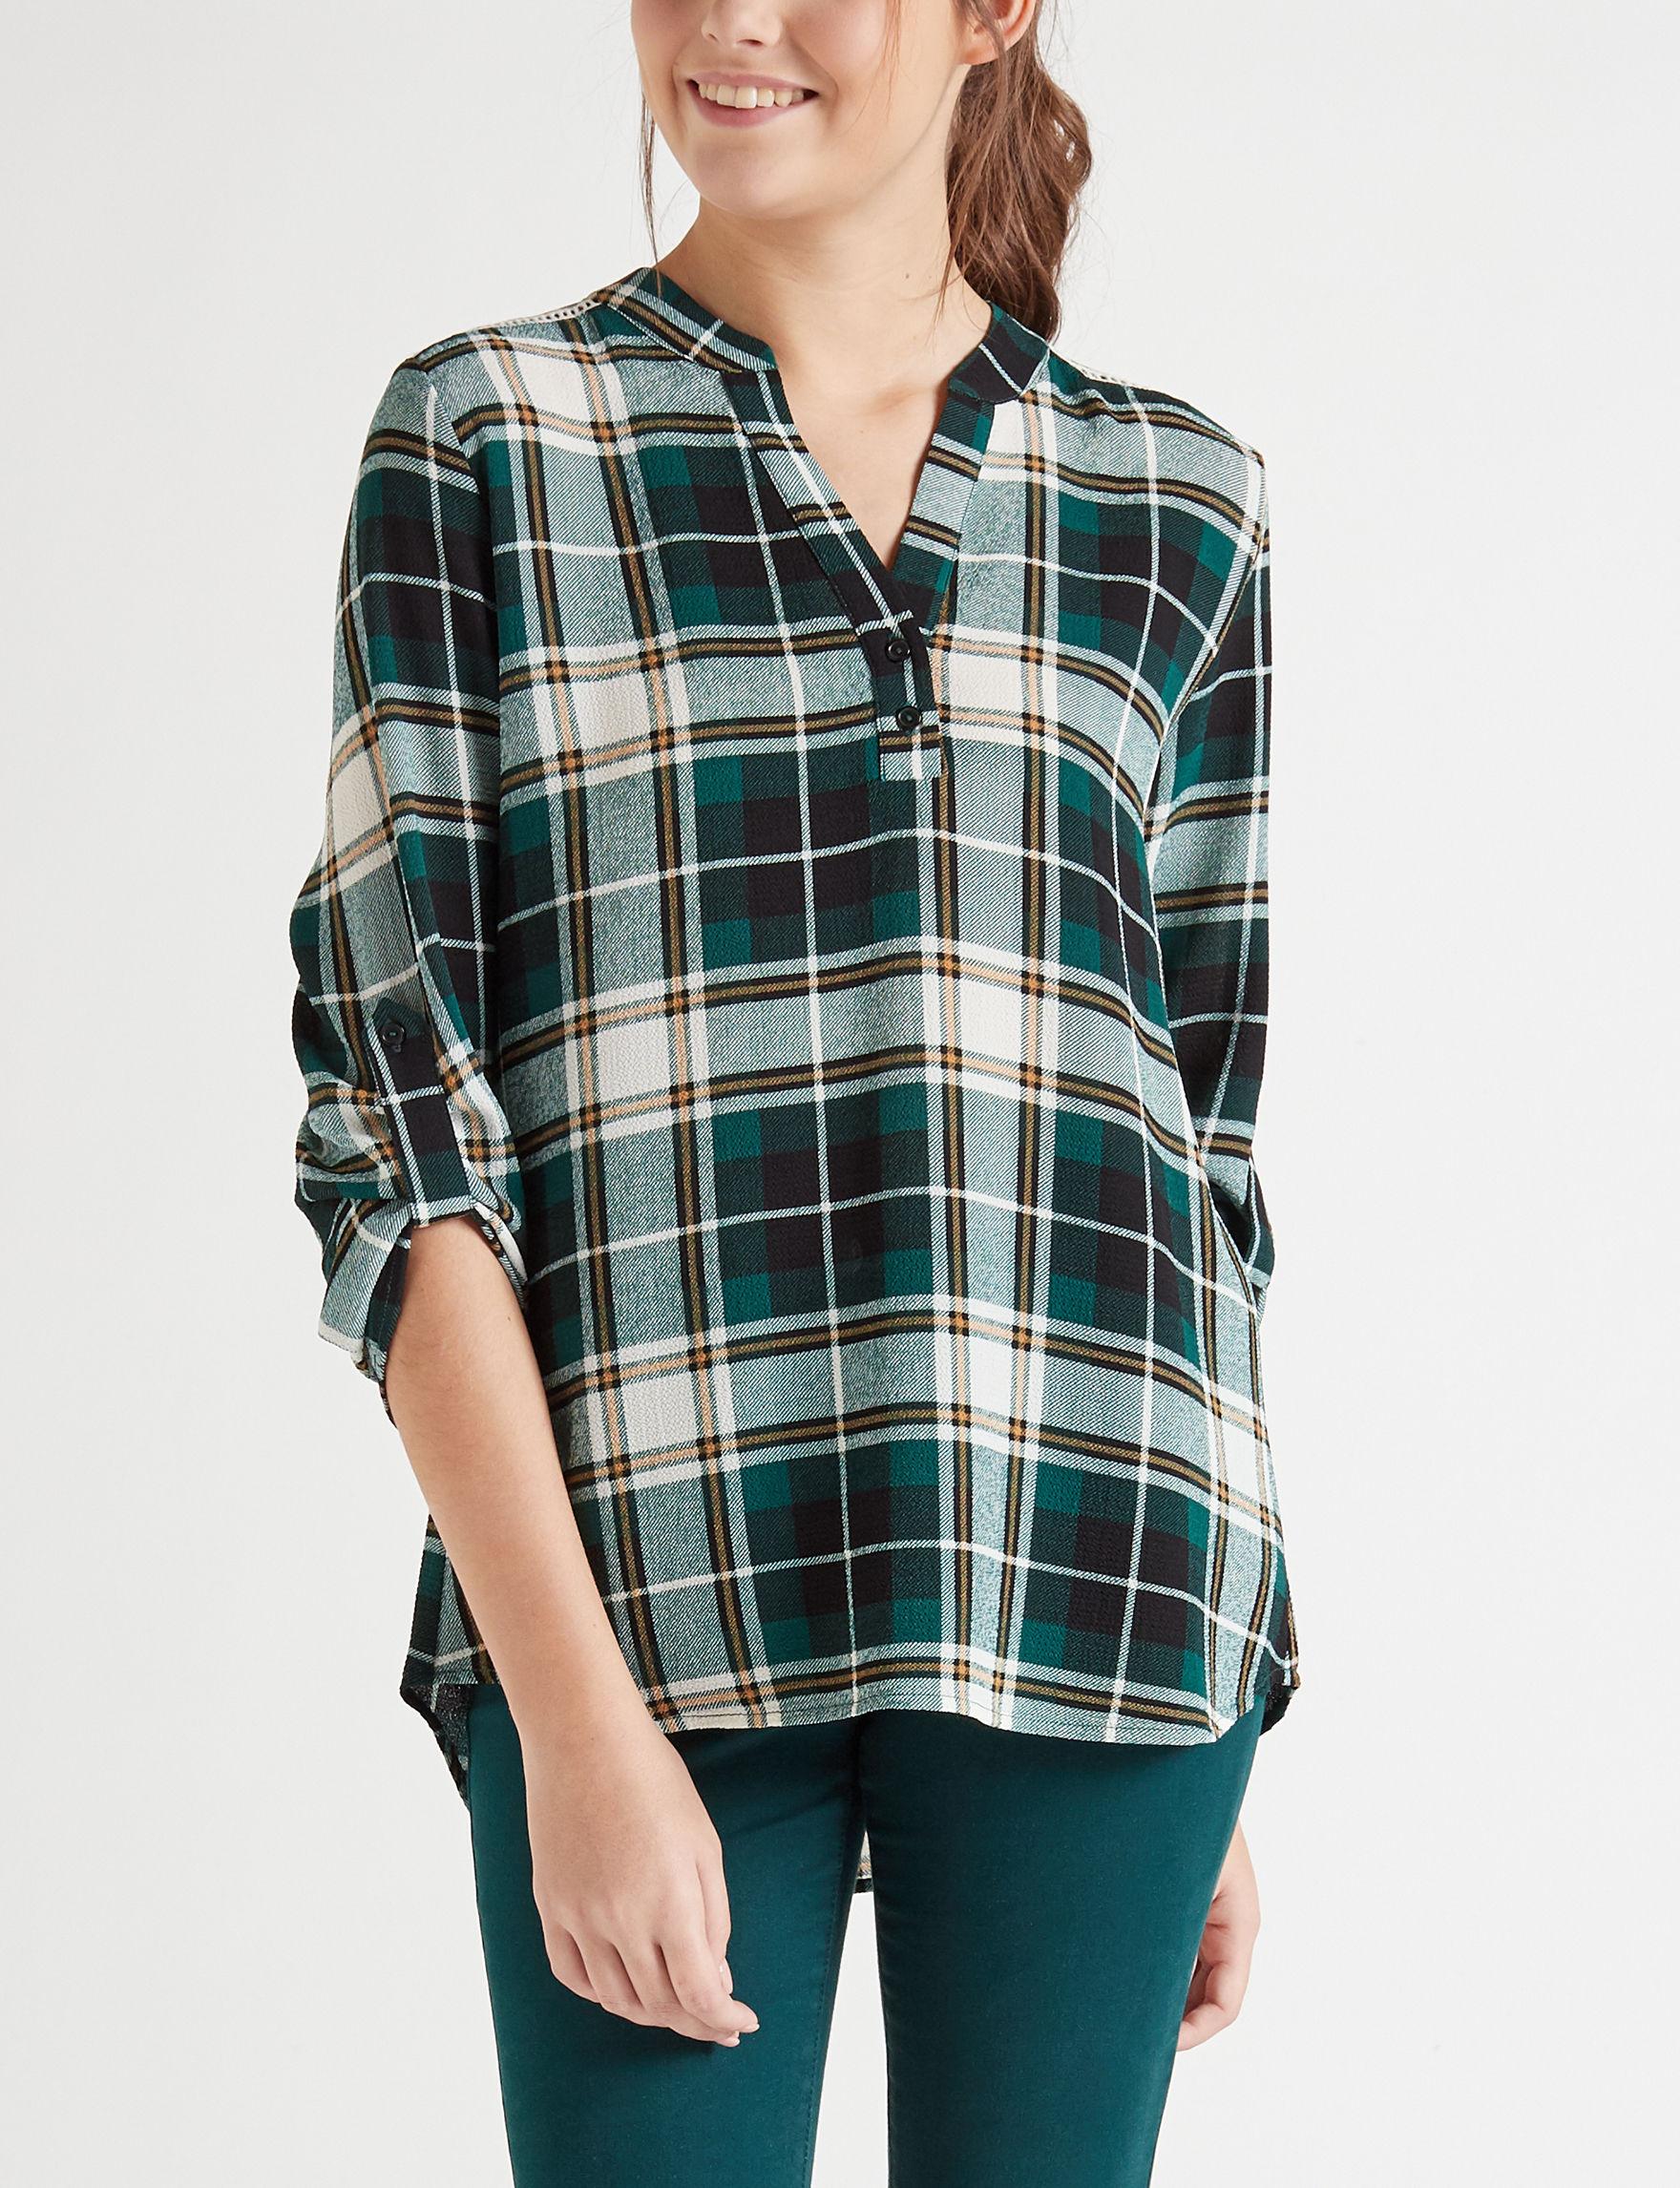 Wishful Park Green Plaid Shirts & Blouses